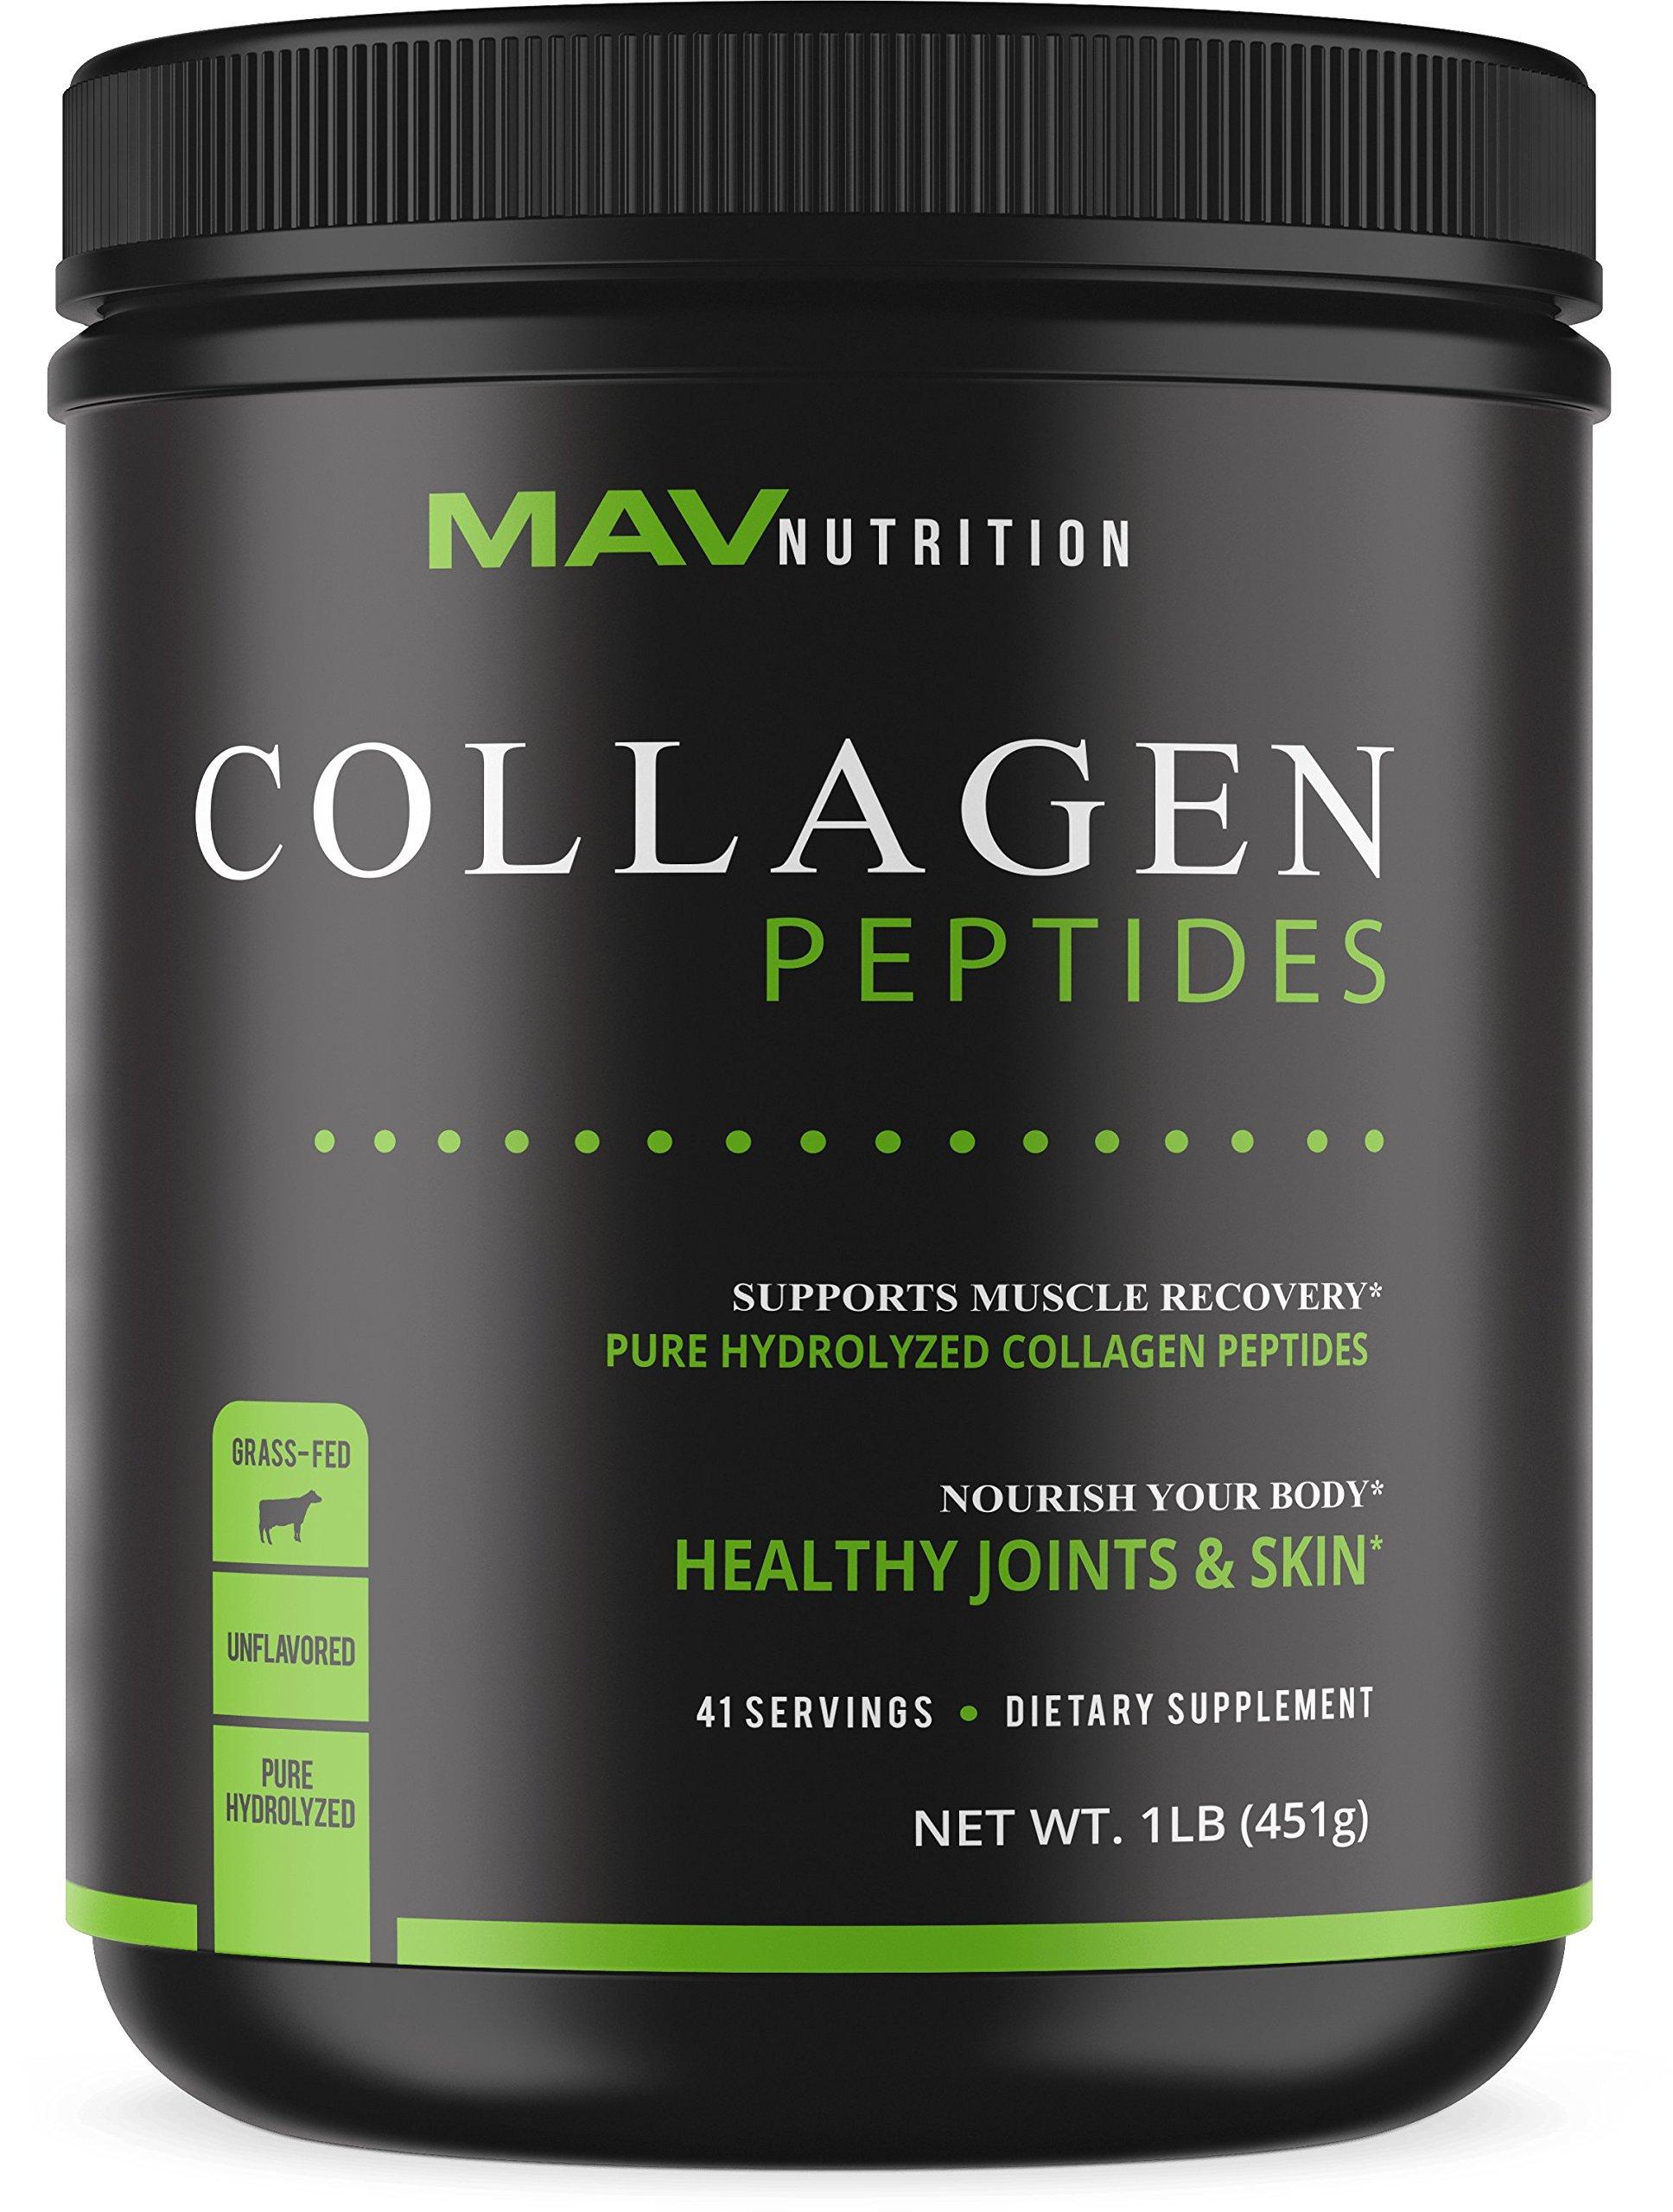 Premium Collagen Peptides (16oz)   Pasture - Raised, Grass - Fed, Paleo Friendly + 100% All Natural + Non - GMO & Gluten Free + Pure Hydrolyzed + Unflavored Collagen Powder